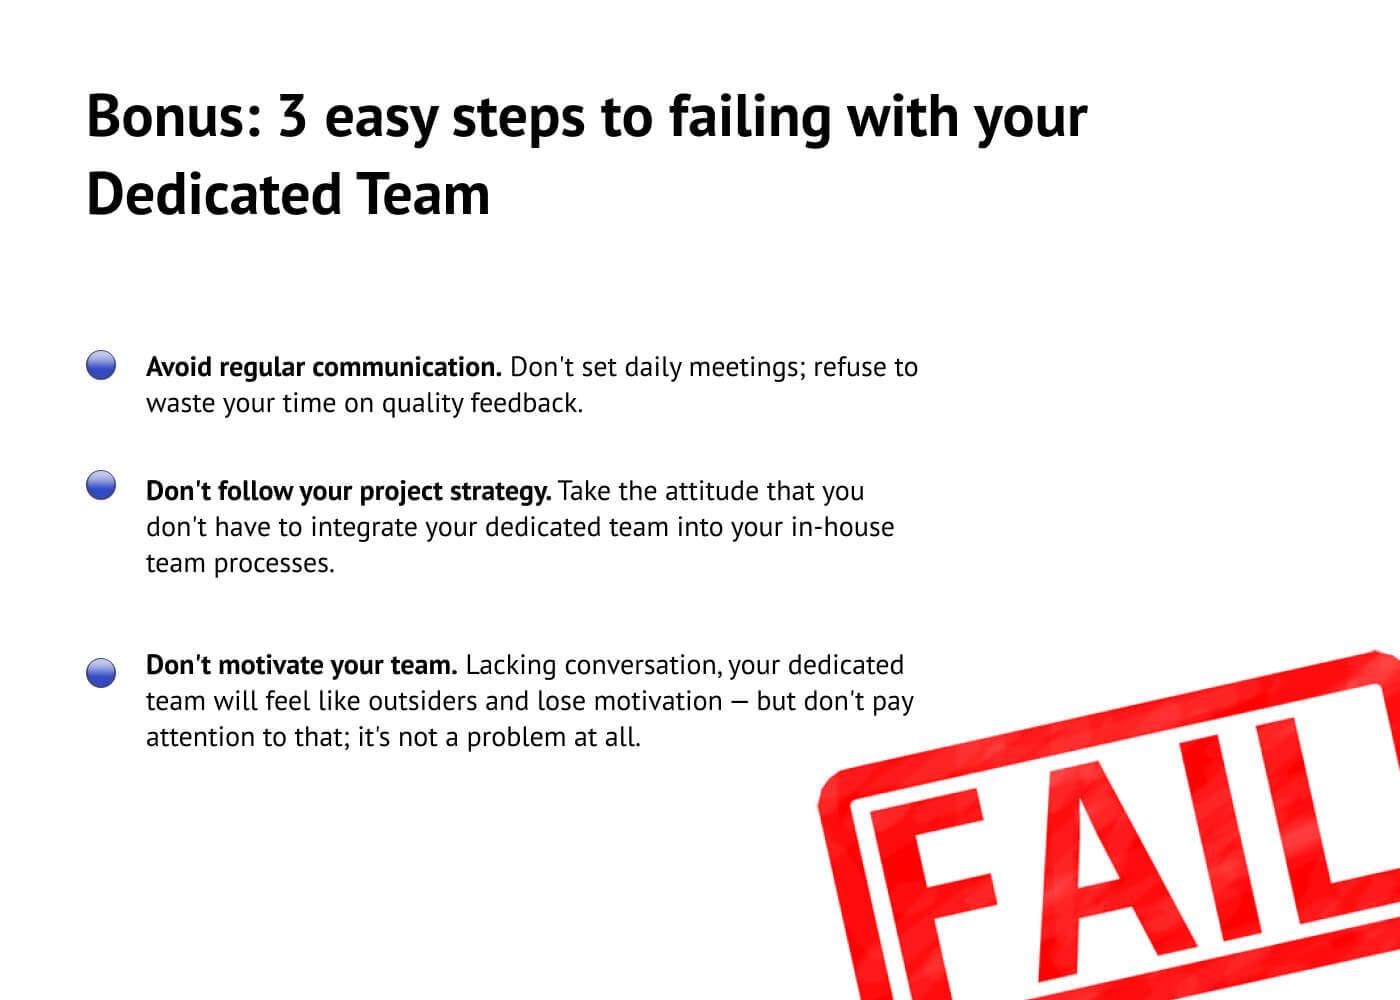 How to fail with a Dedicated Team: pranksterish advice.